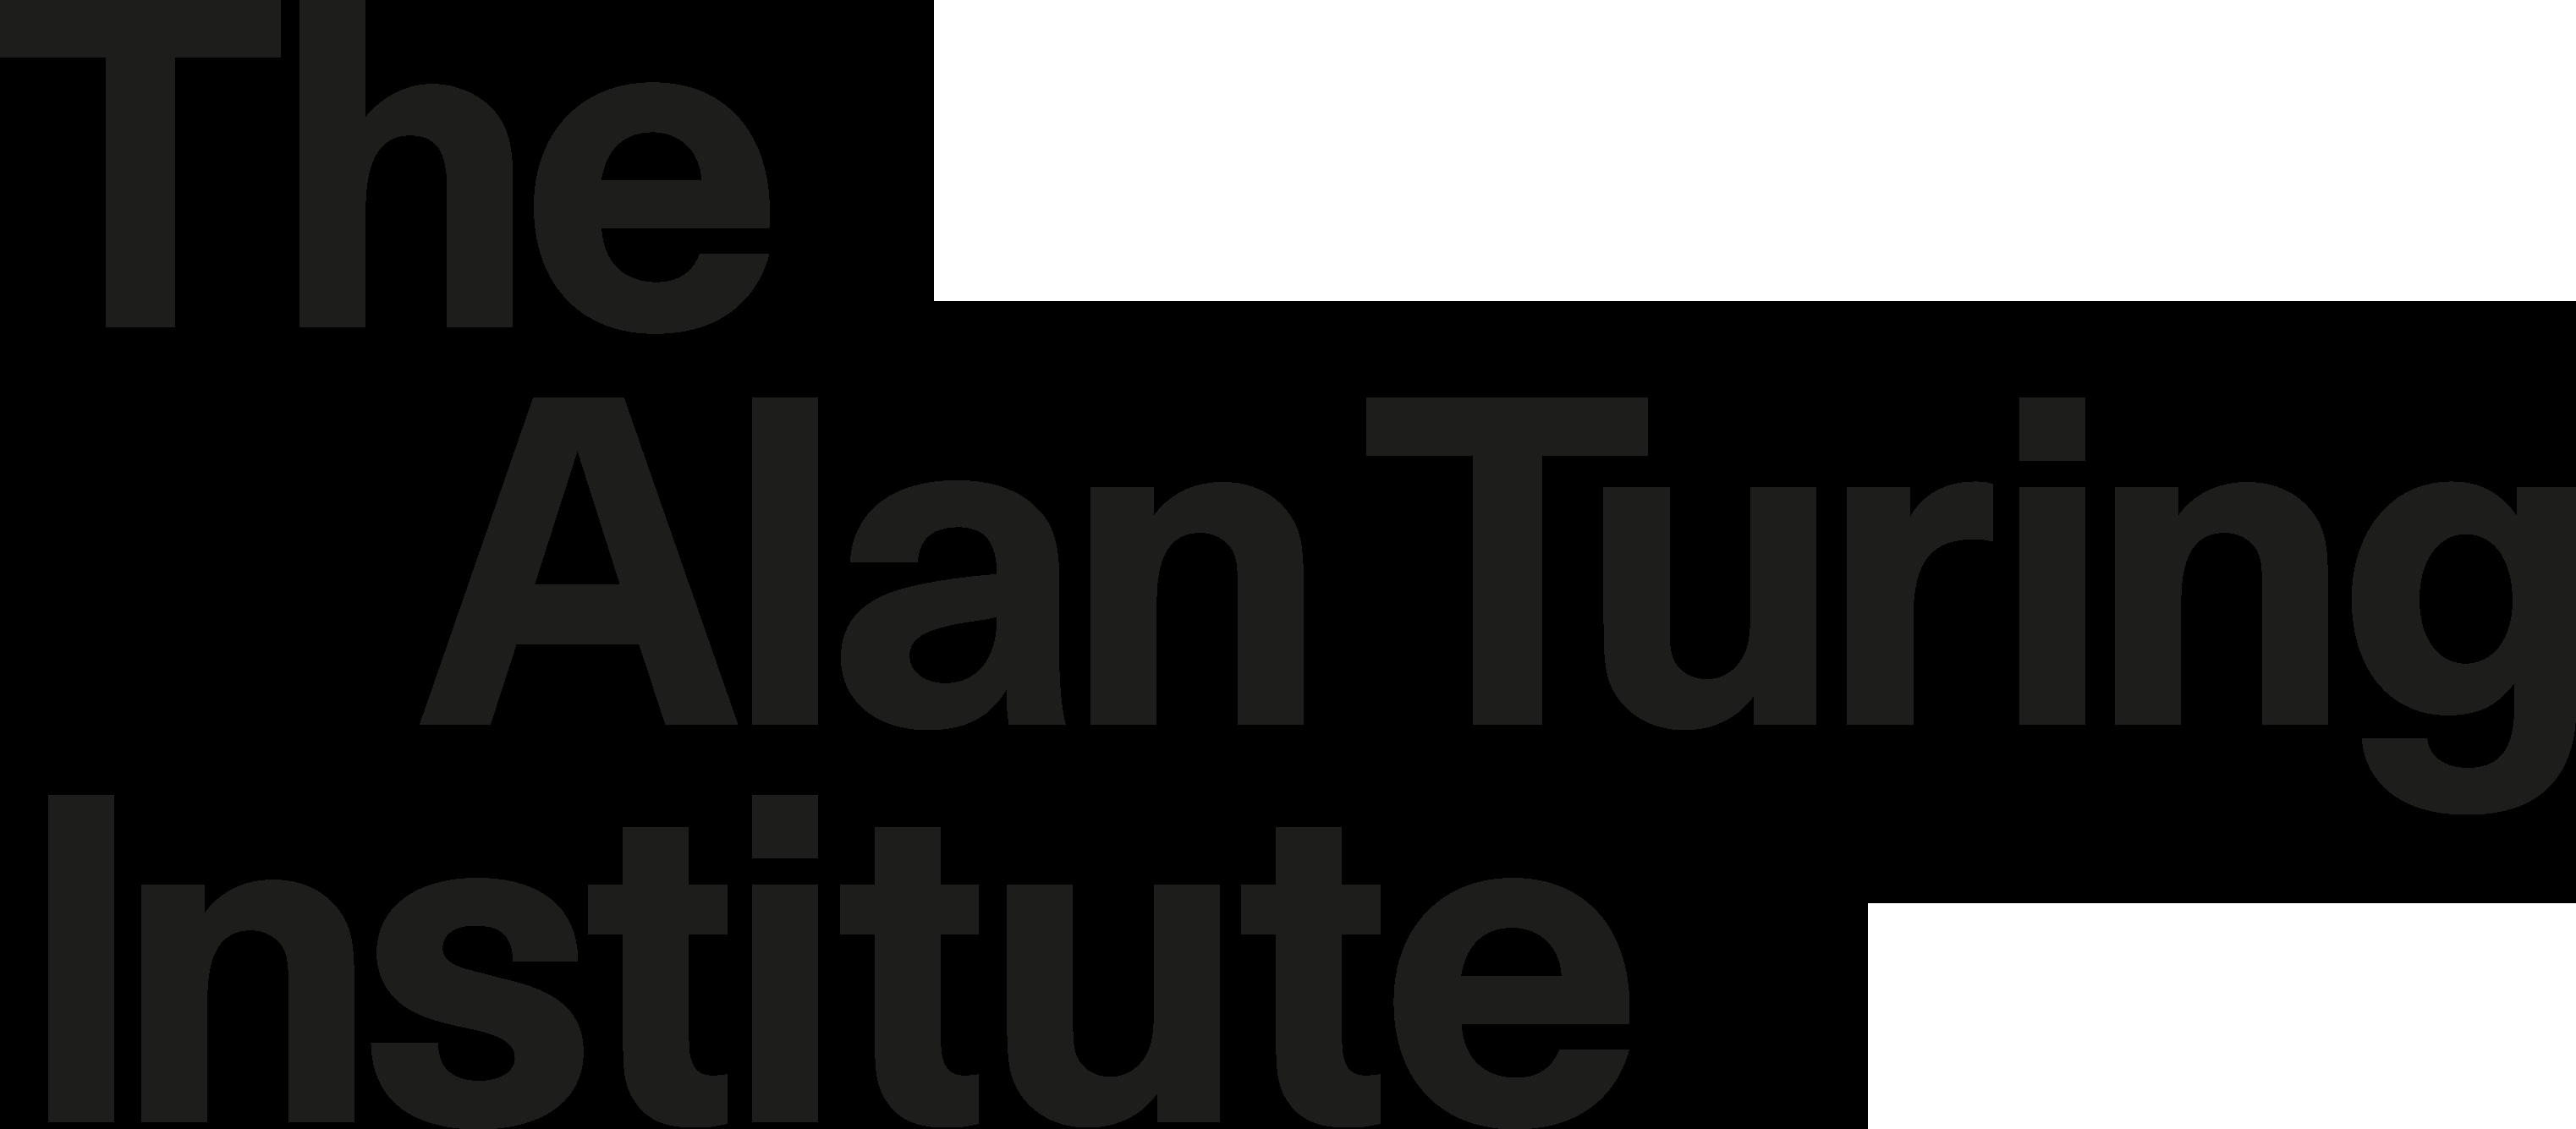 The Alan Turing Institute